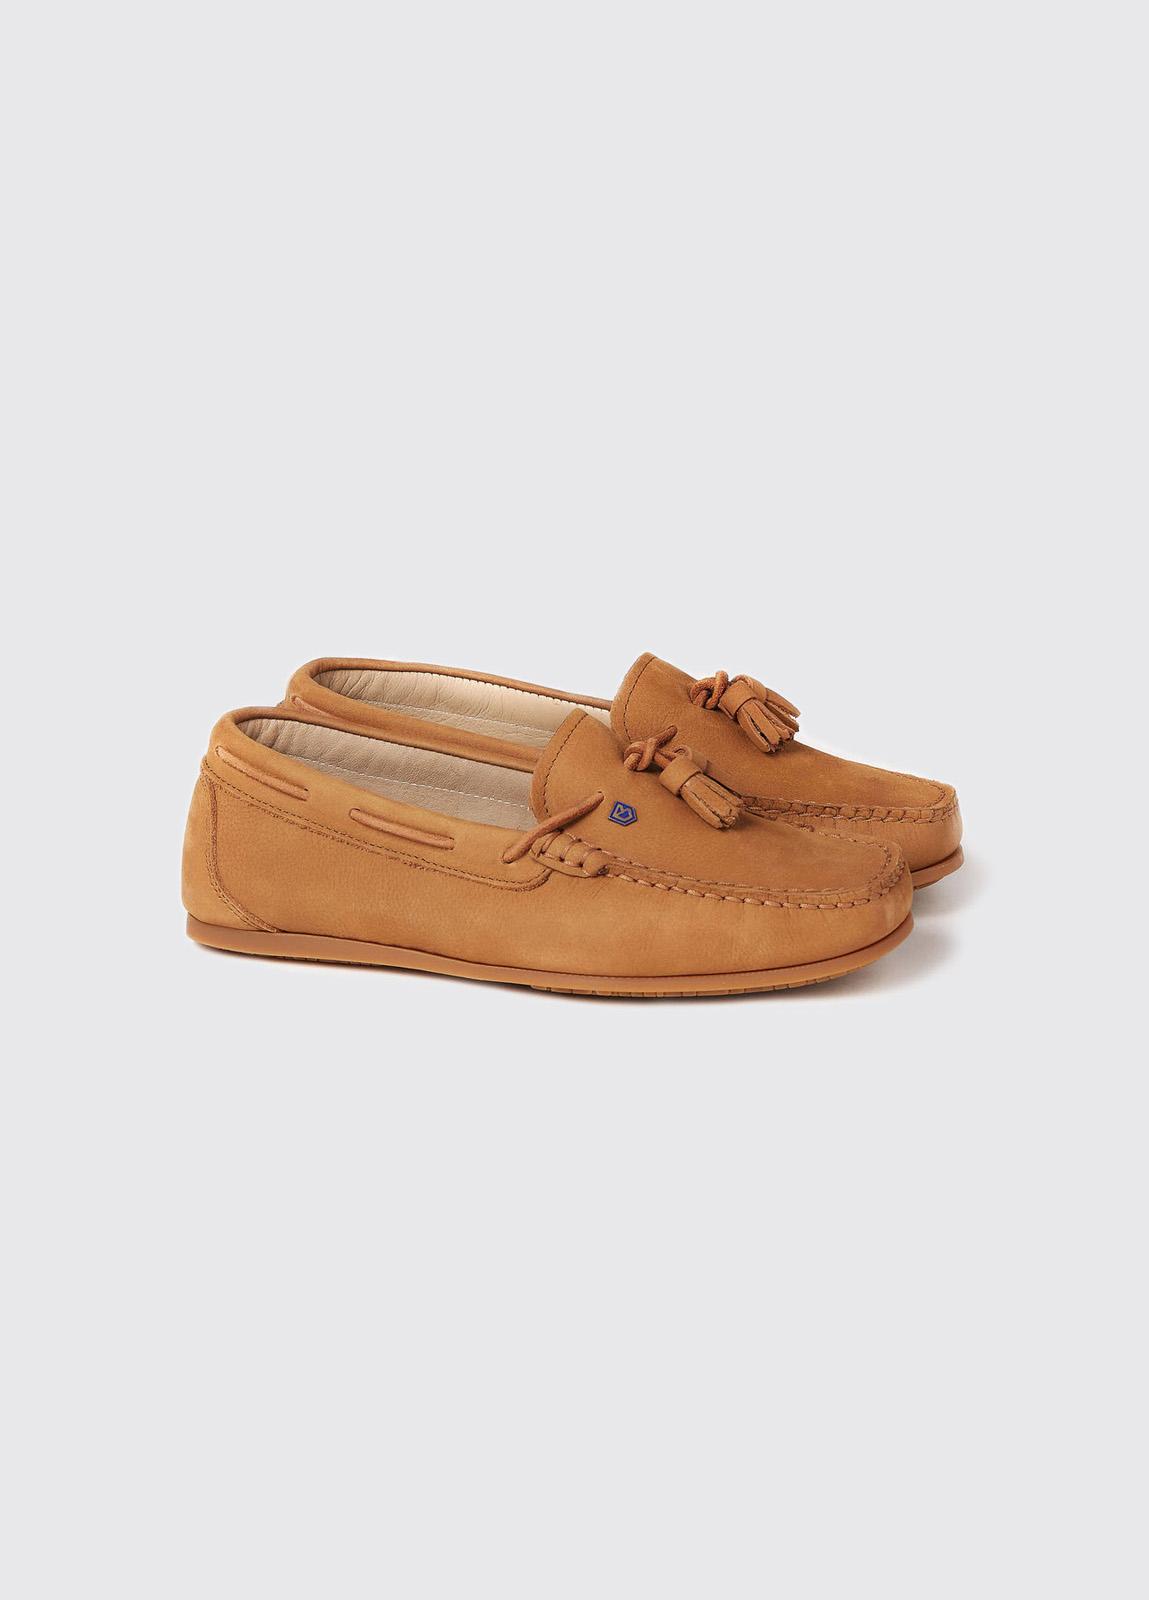 Jamaica Loafer - Tan